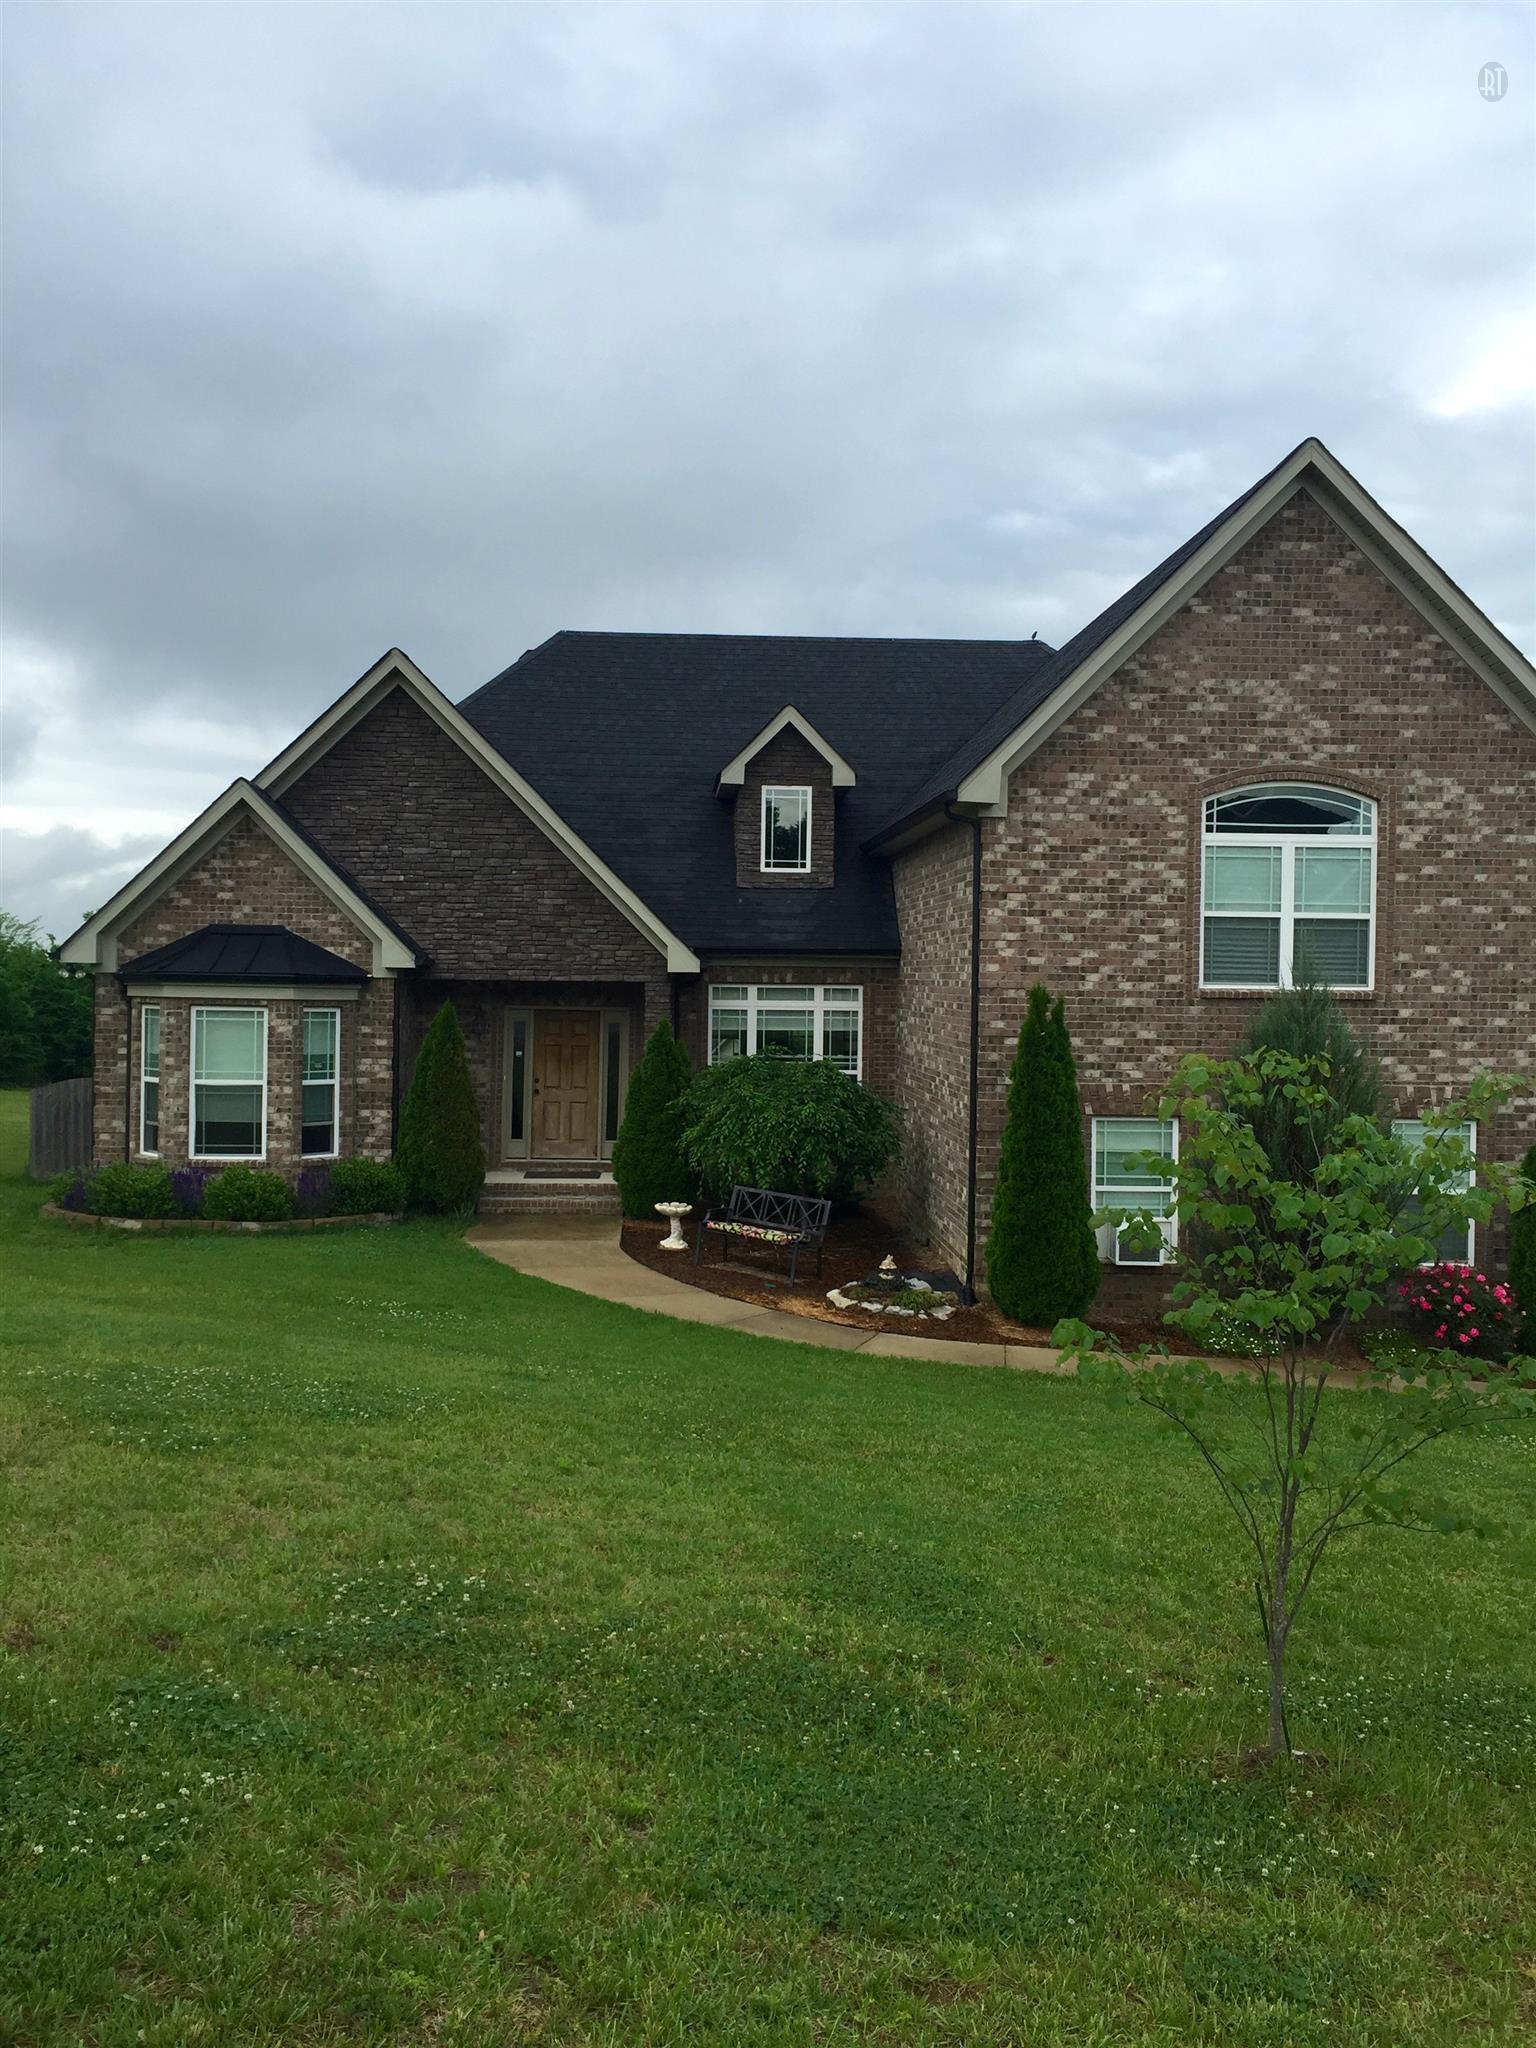 2012 W Mclaughlin St, Smyrna, TN 37167